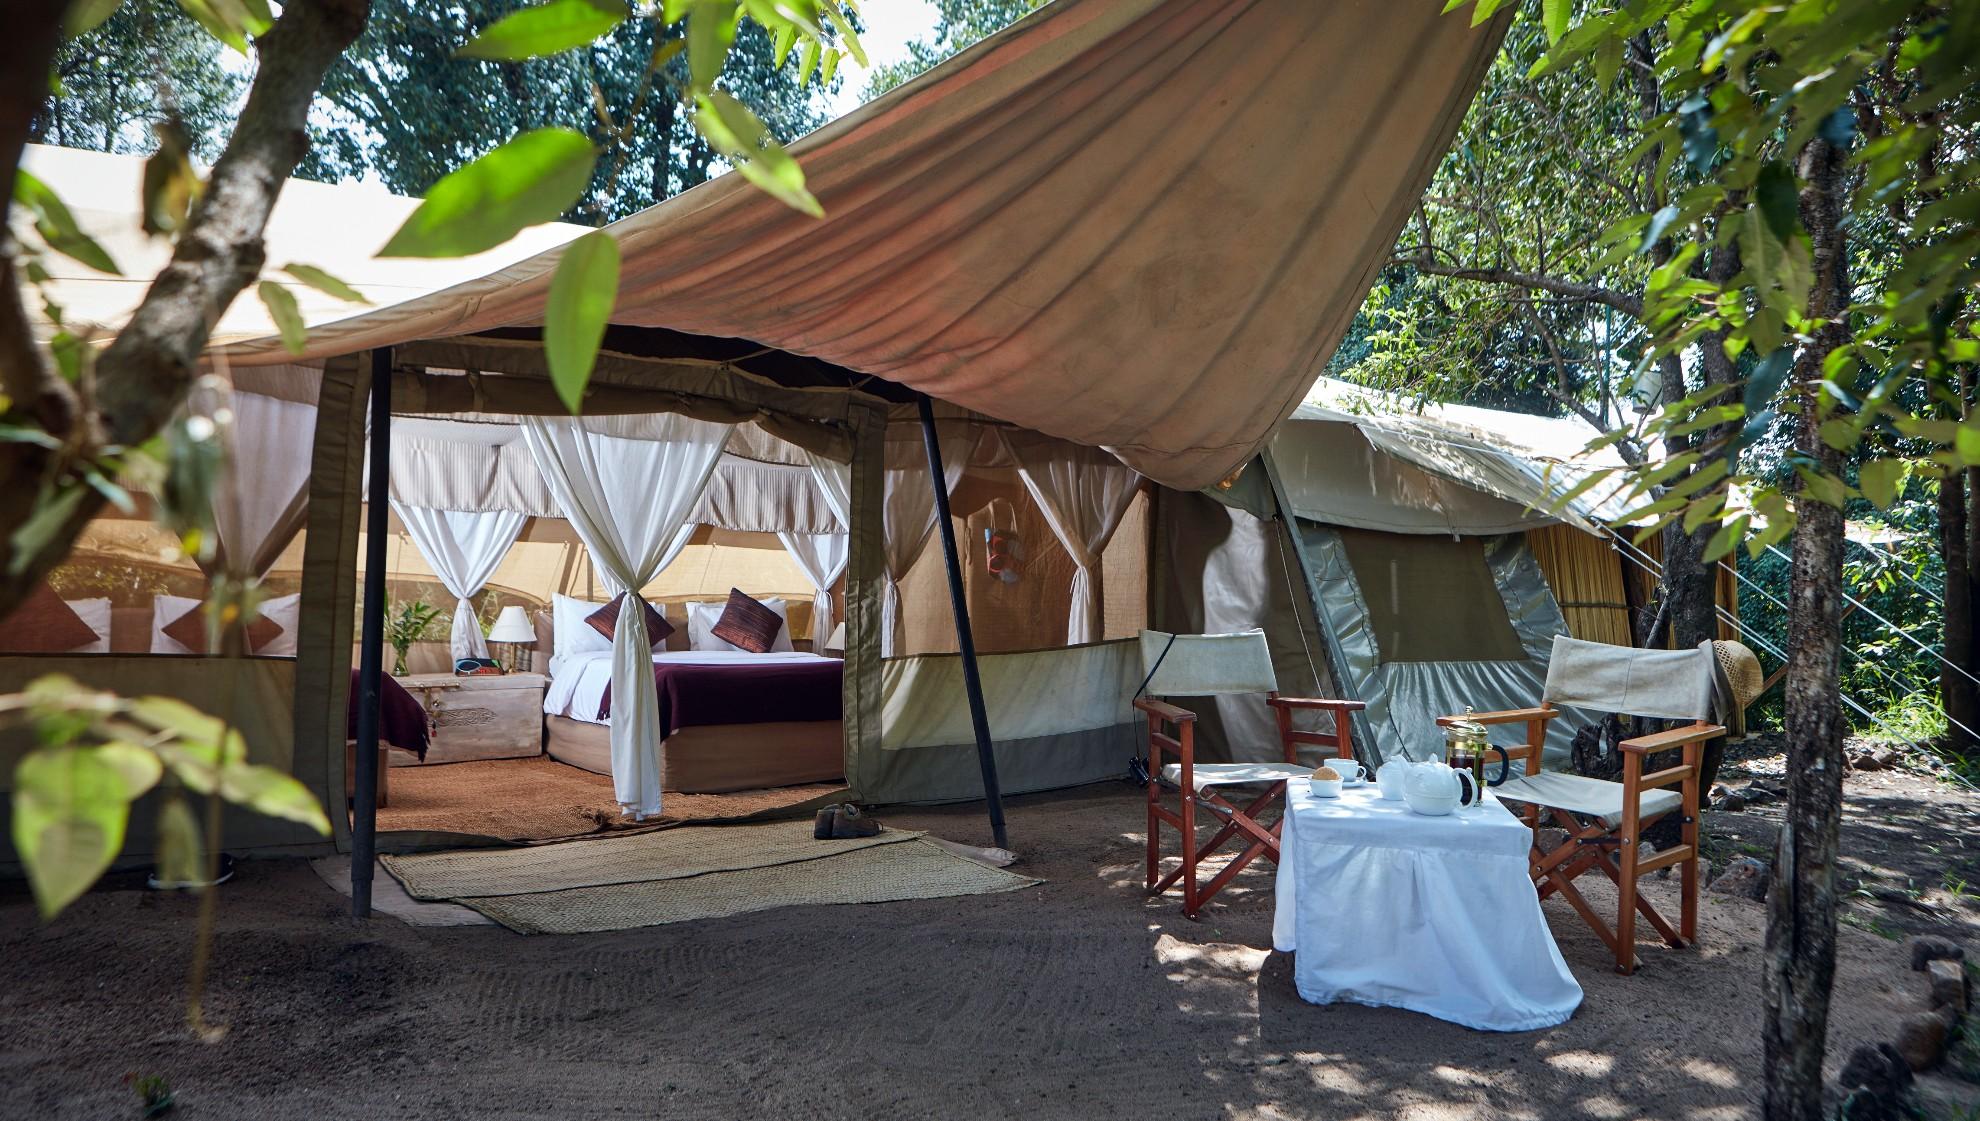 Kenya - Masai Mara - 12890 - Tented Accommodation